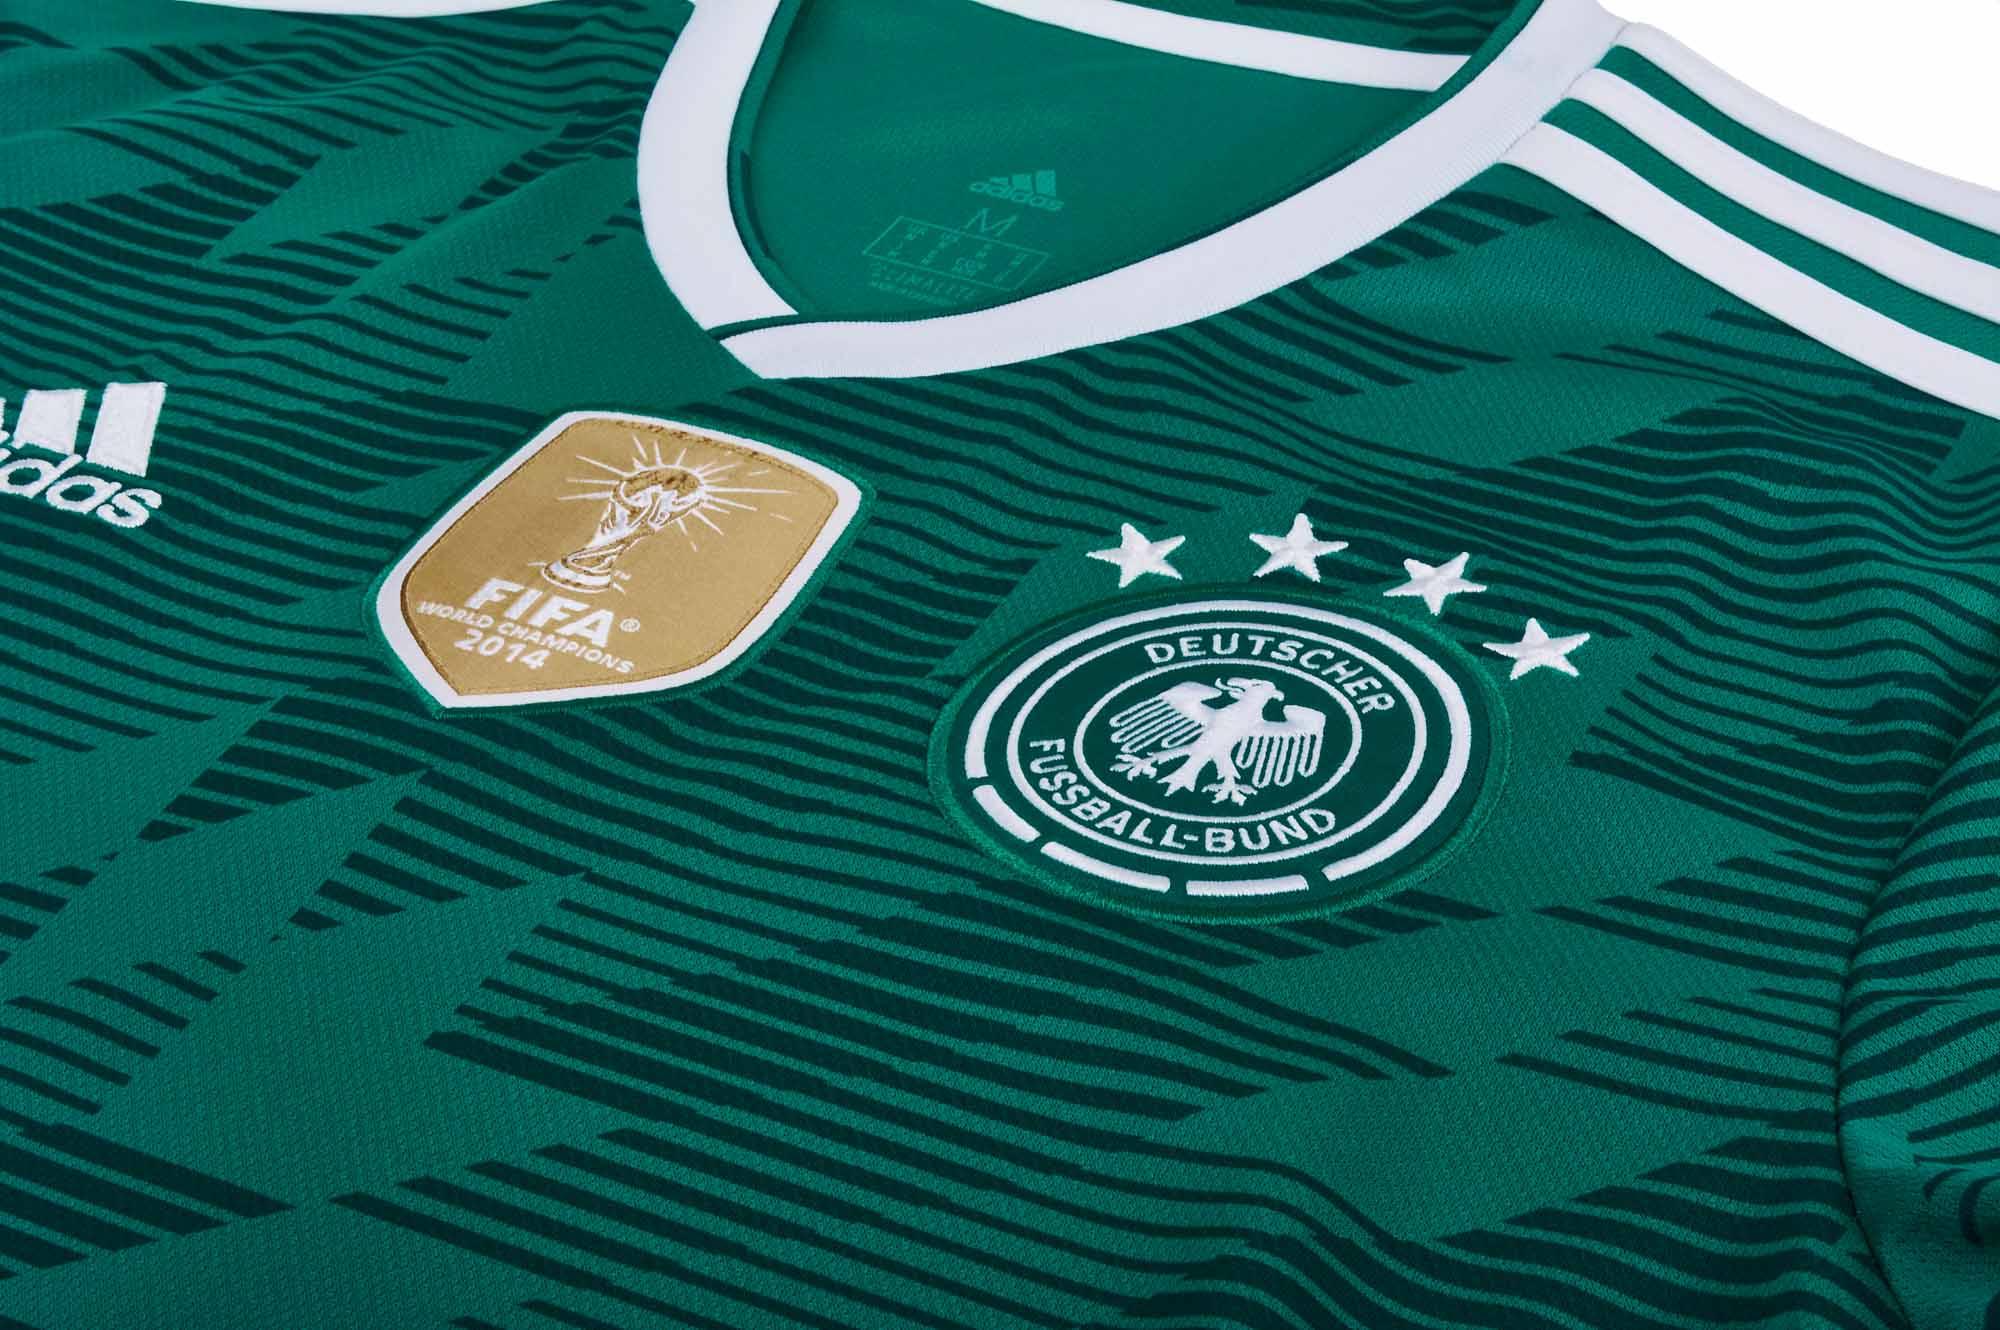 b902c19f03f adidas Germany Away Jersey 2018-19 - SoccerPro.com